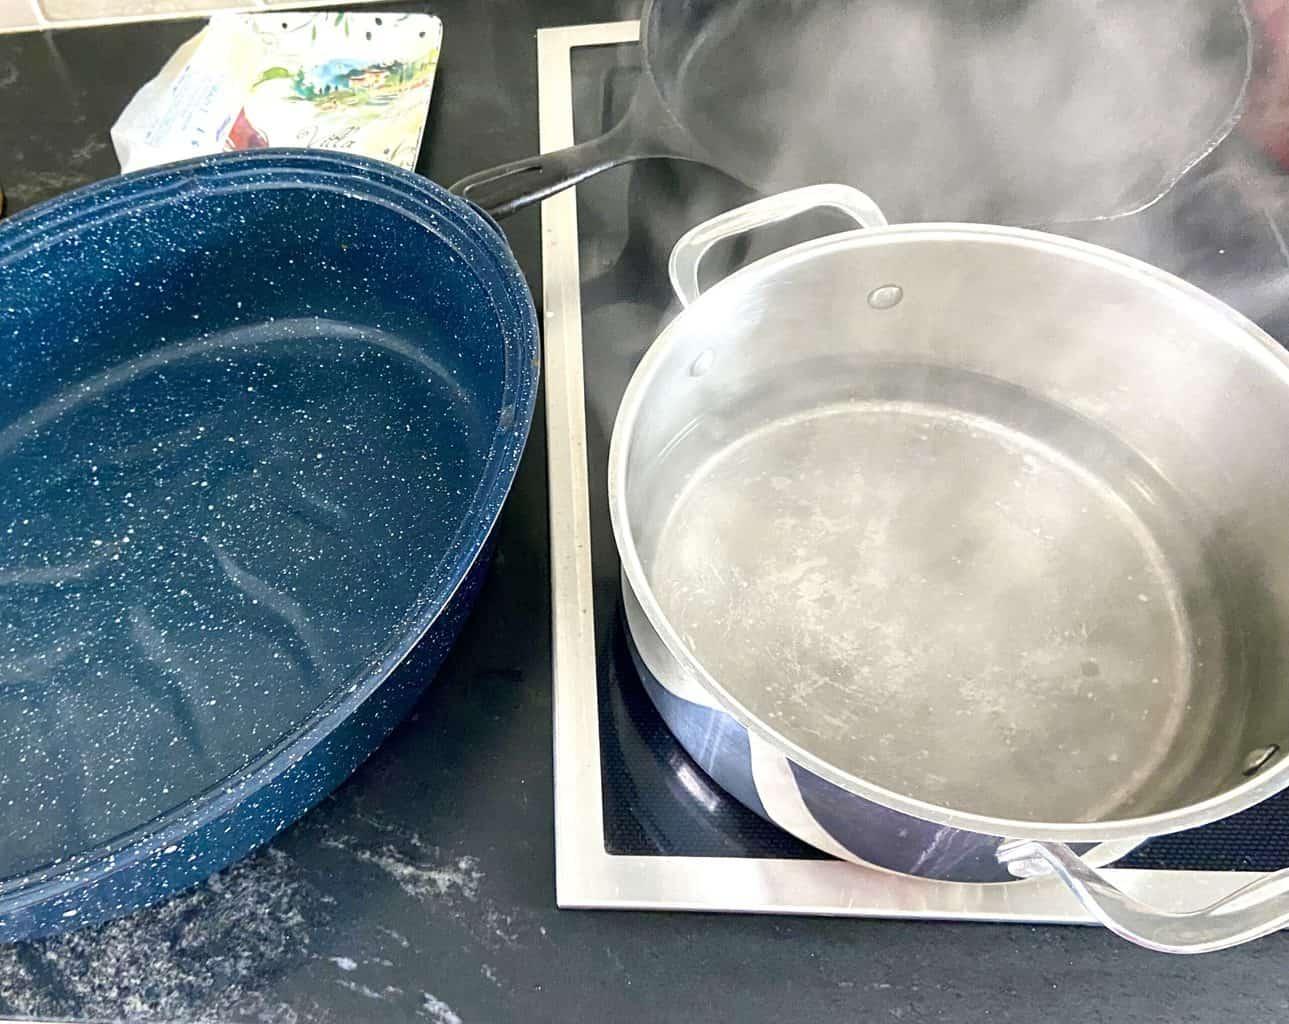 Roasting pan next to pot of boiling water.